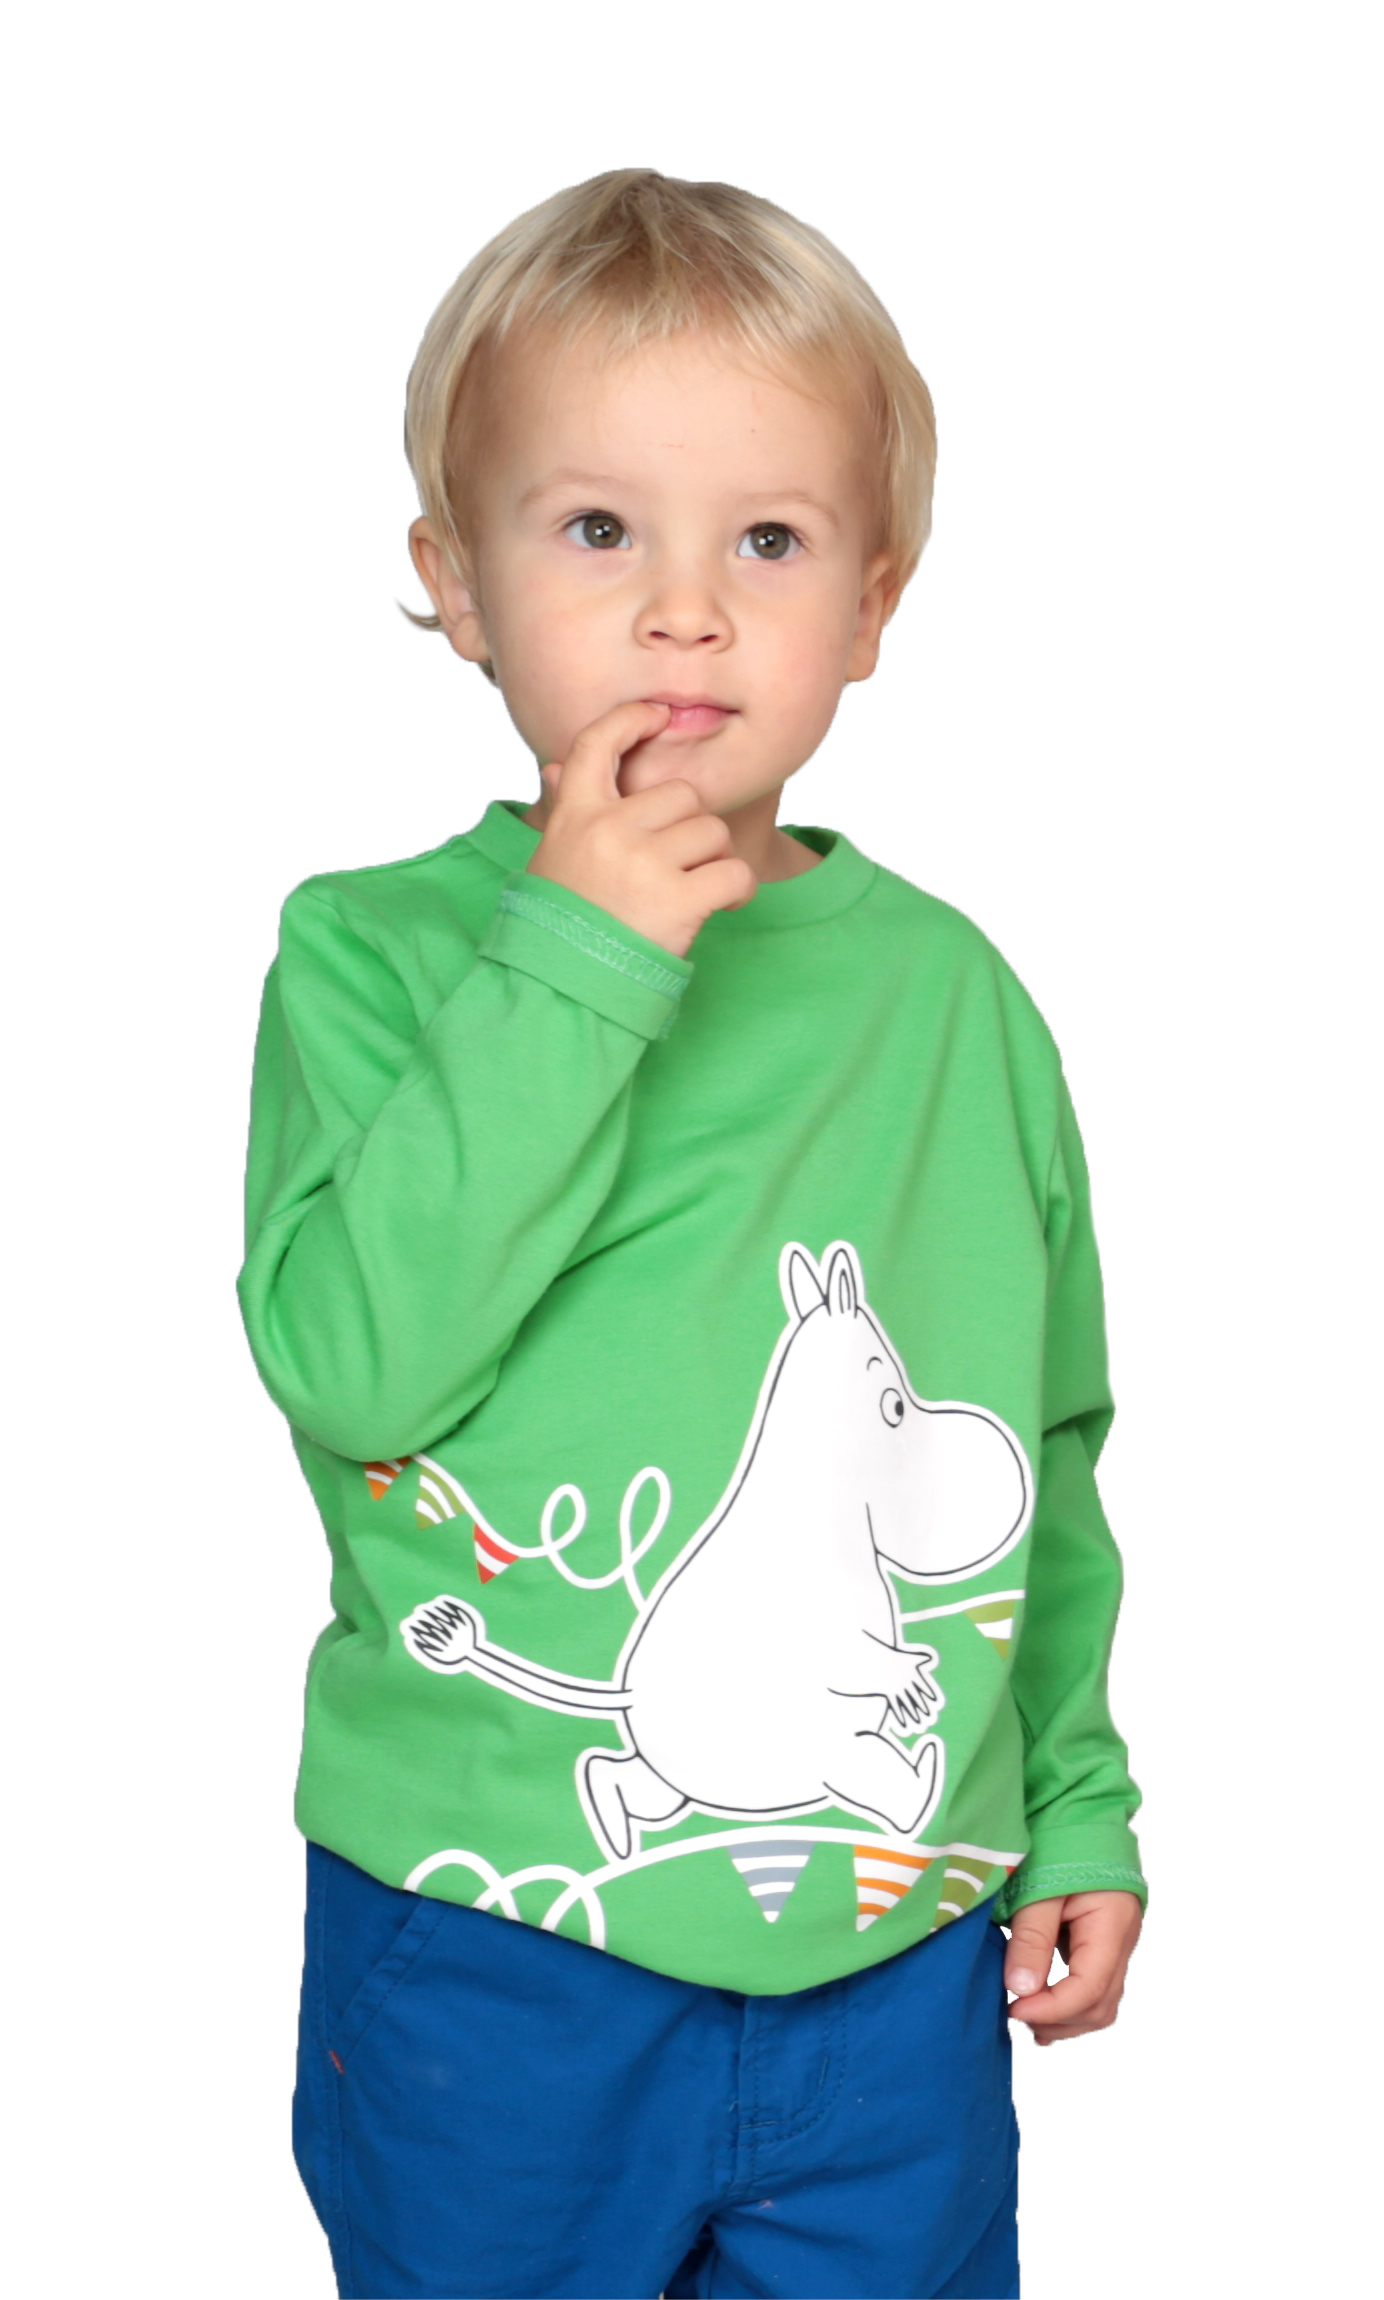 Martinex Moomin Flag Shirt